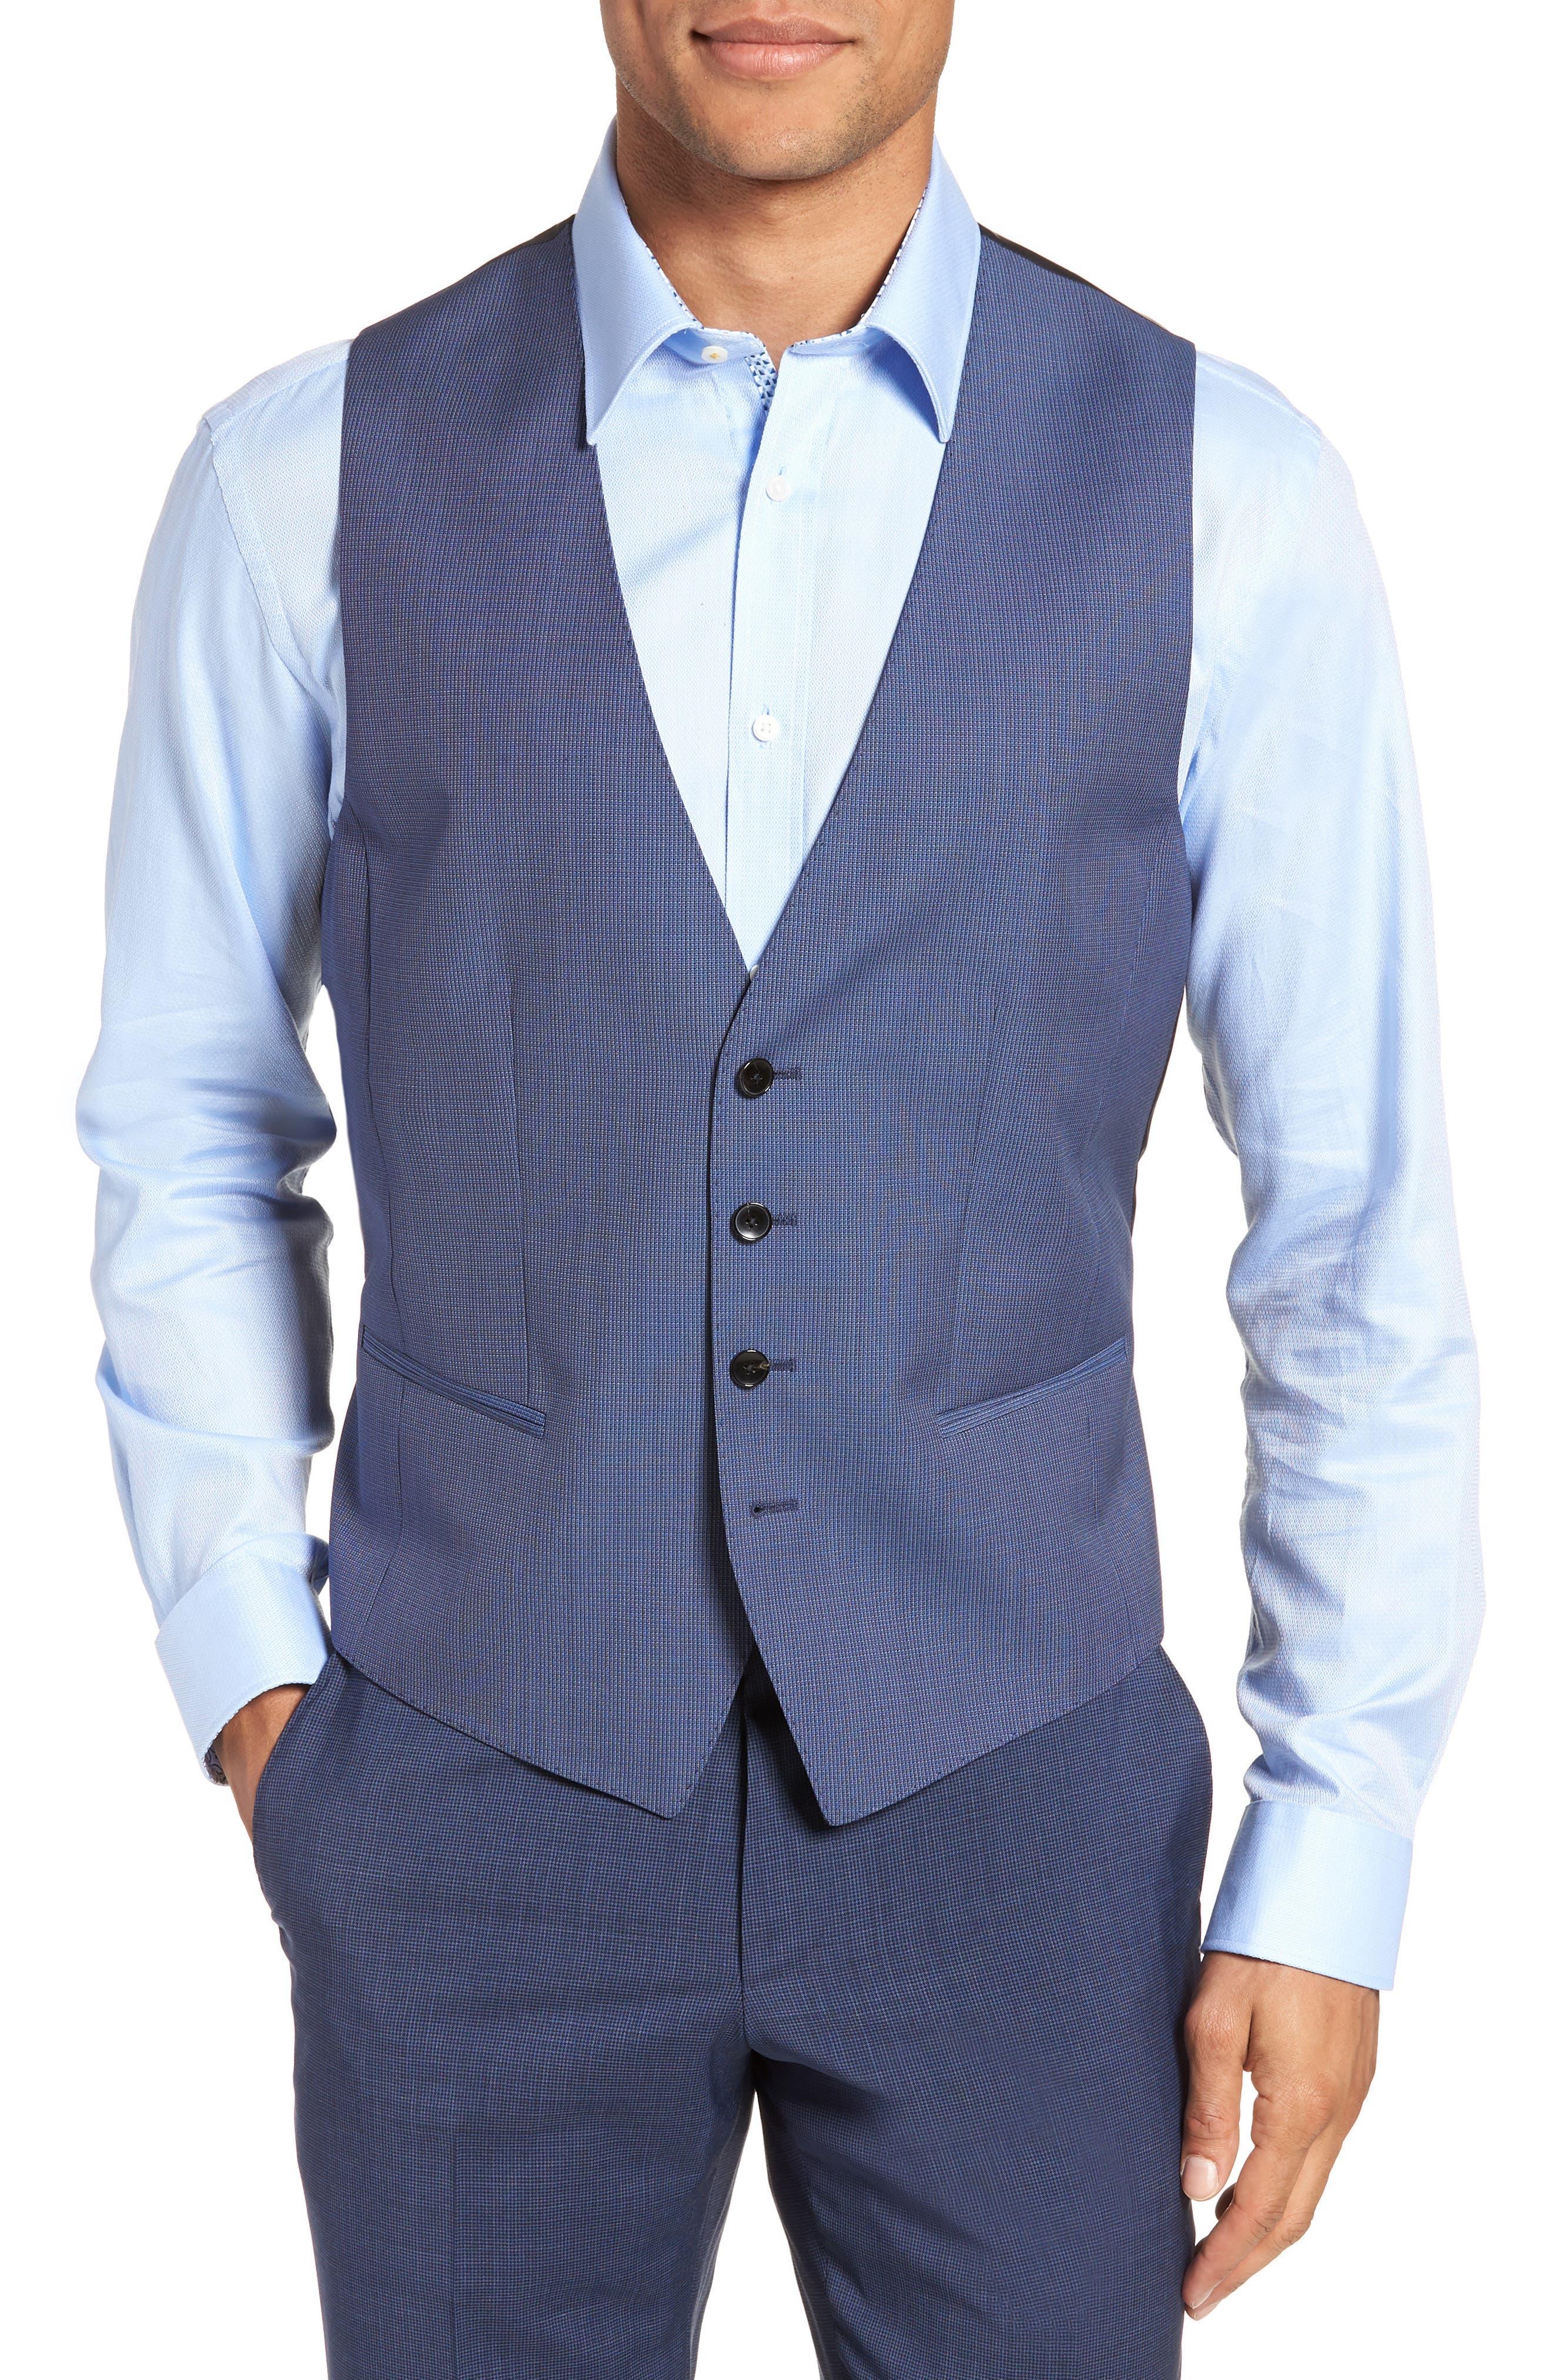 Huge/Genius Trim Fit Solid Three Piece Wool Suit,                             Alternate thumbnail 5, color,                             BLUE